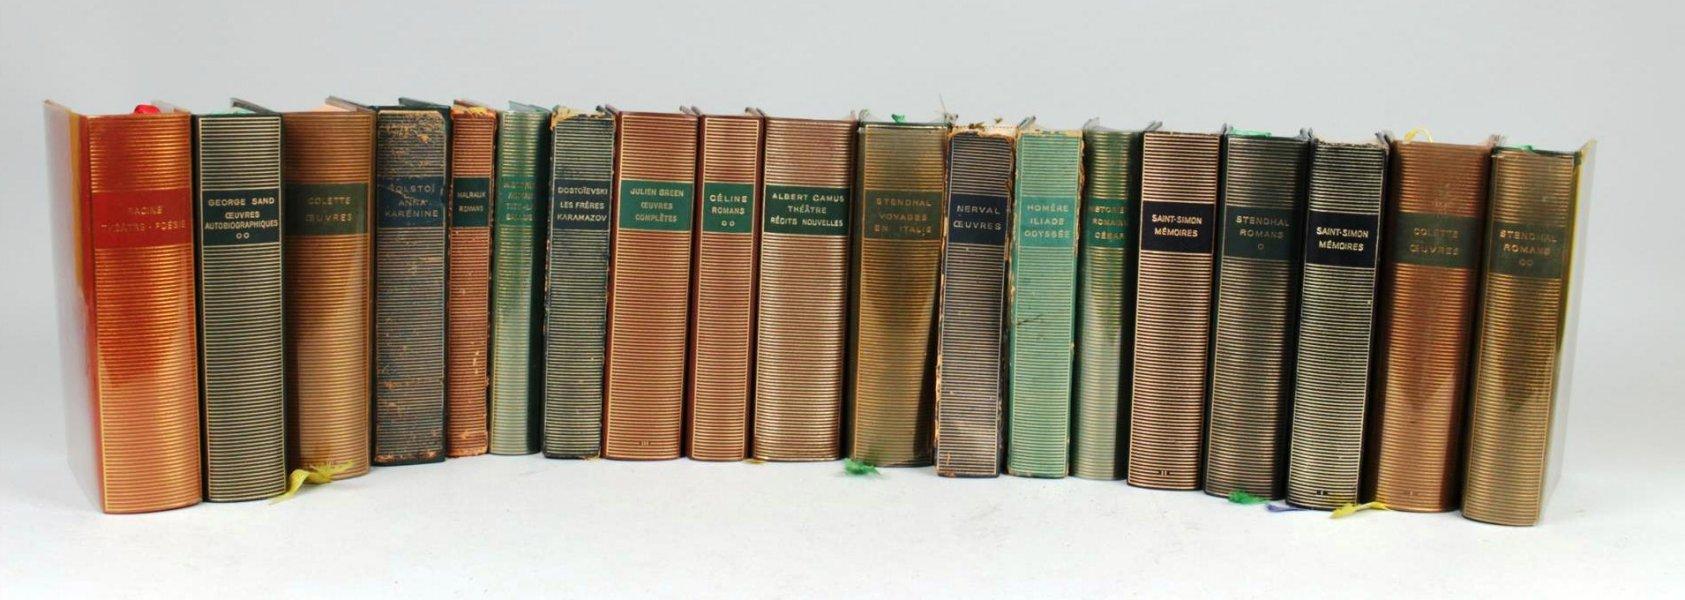 dix-neuf-volumes-aux-editions-la-pleiade-accidents-2